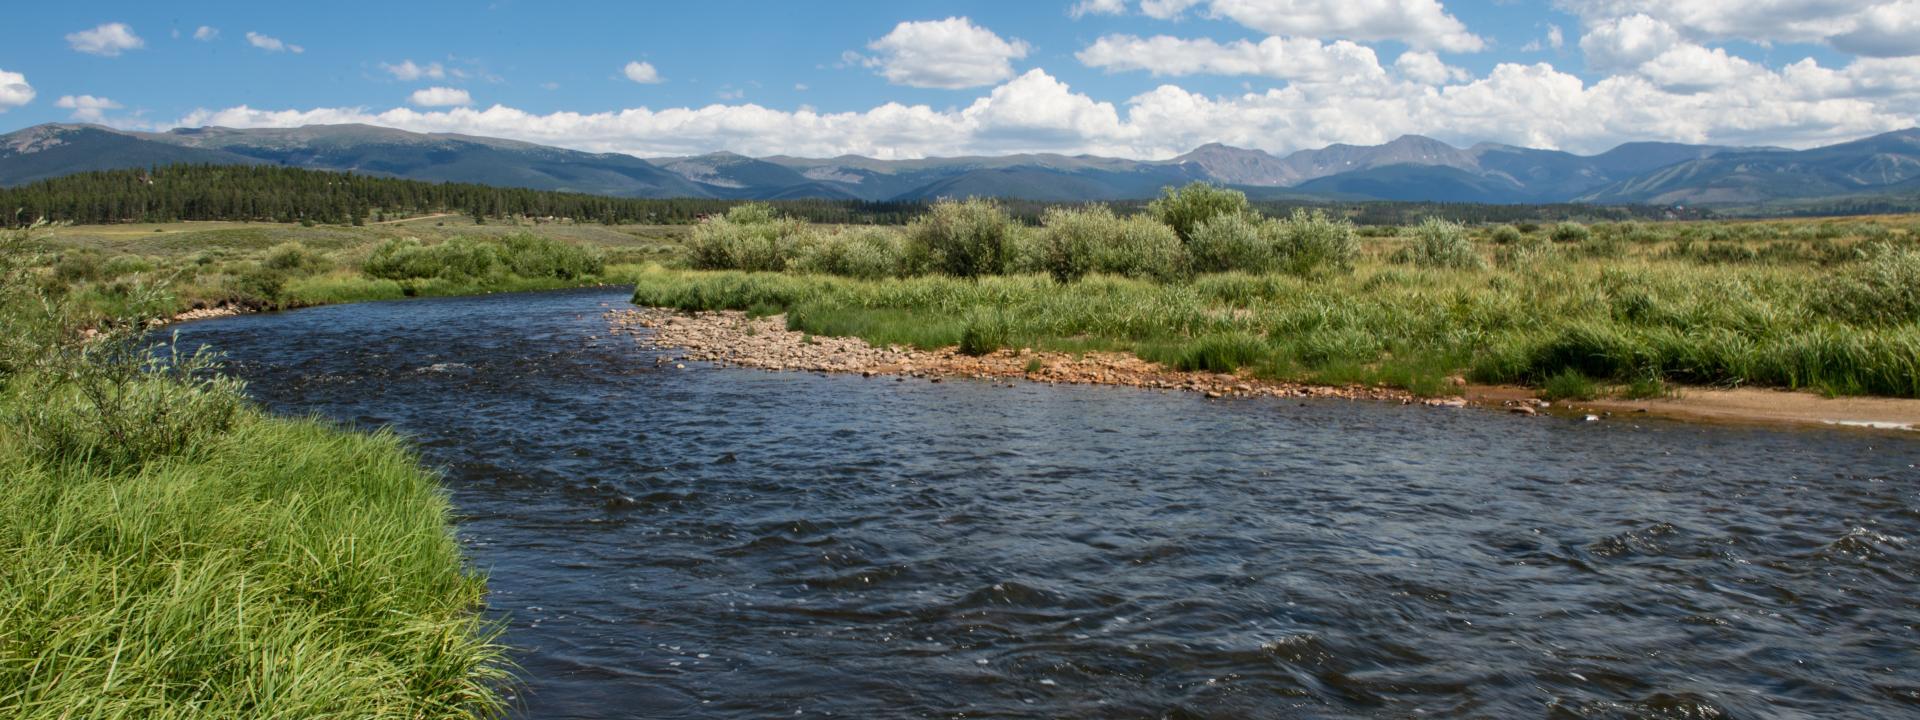 Fraser River in Winter Park, Colorado